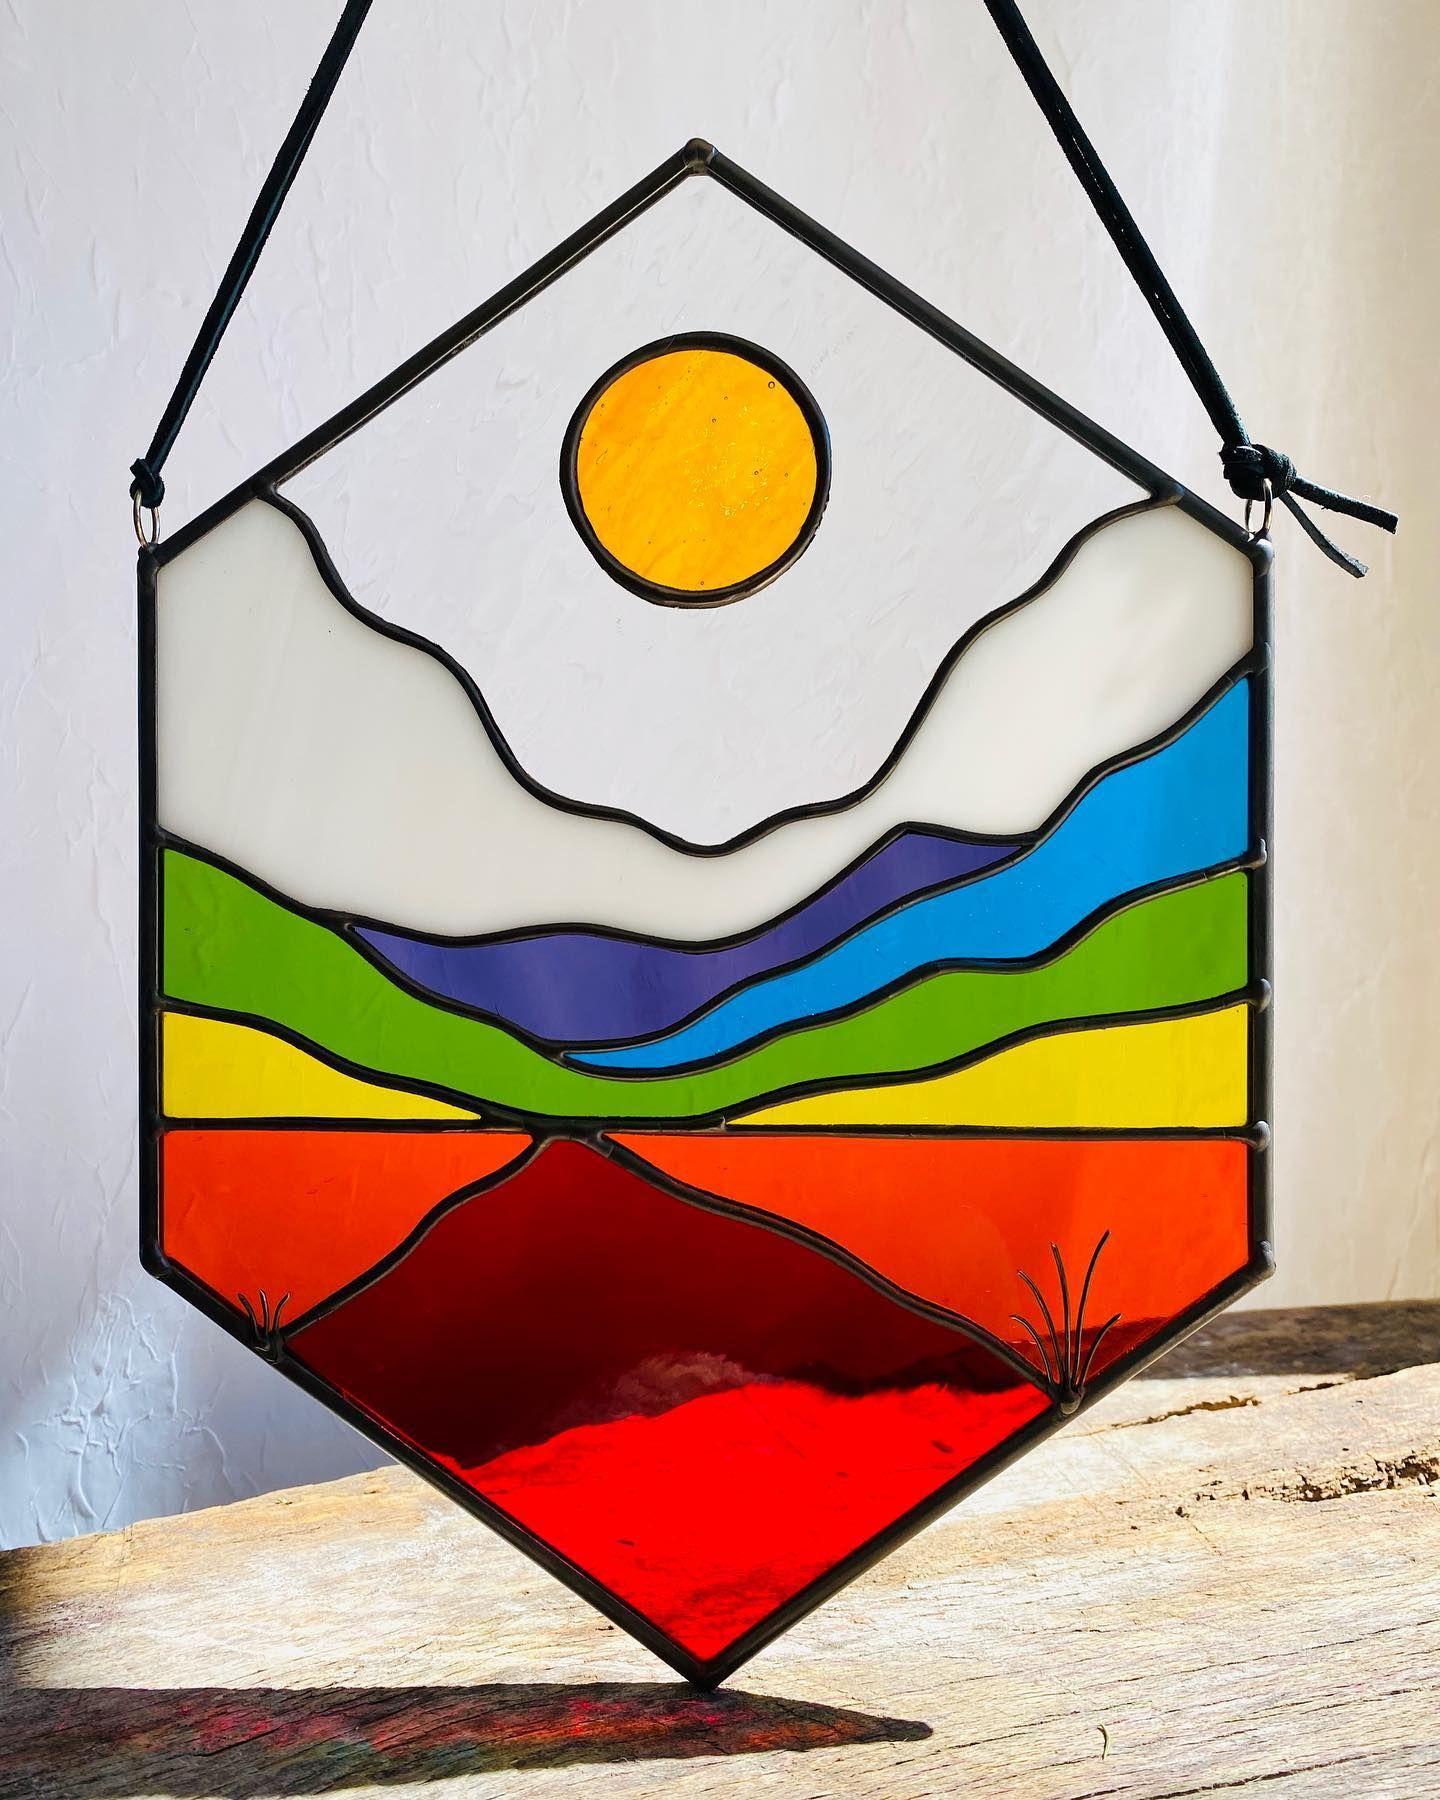 The Dude Fused Glass Suncatcher